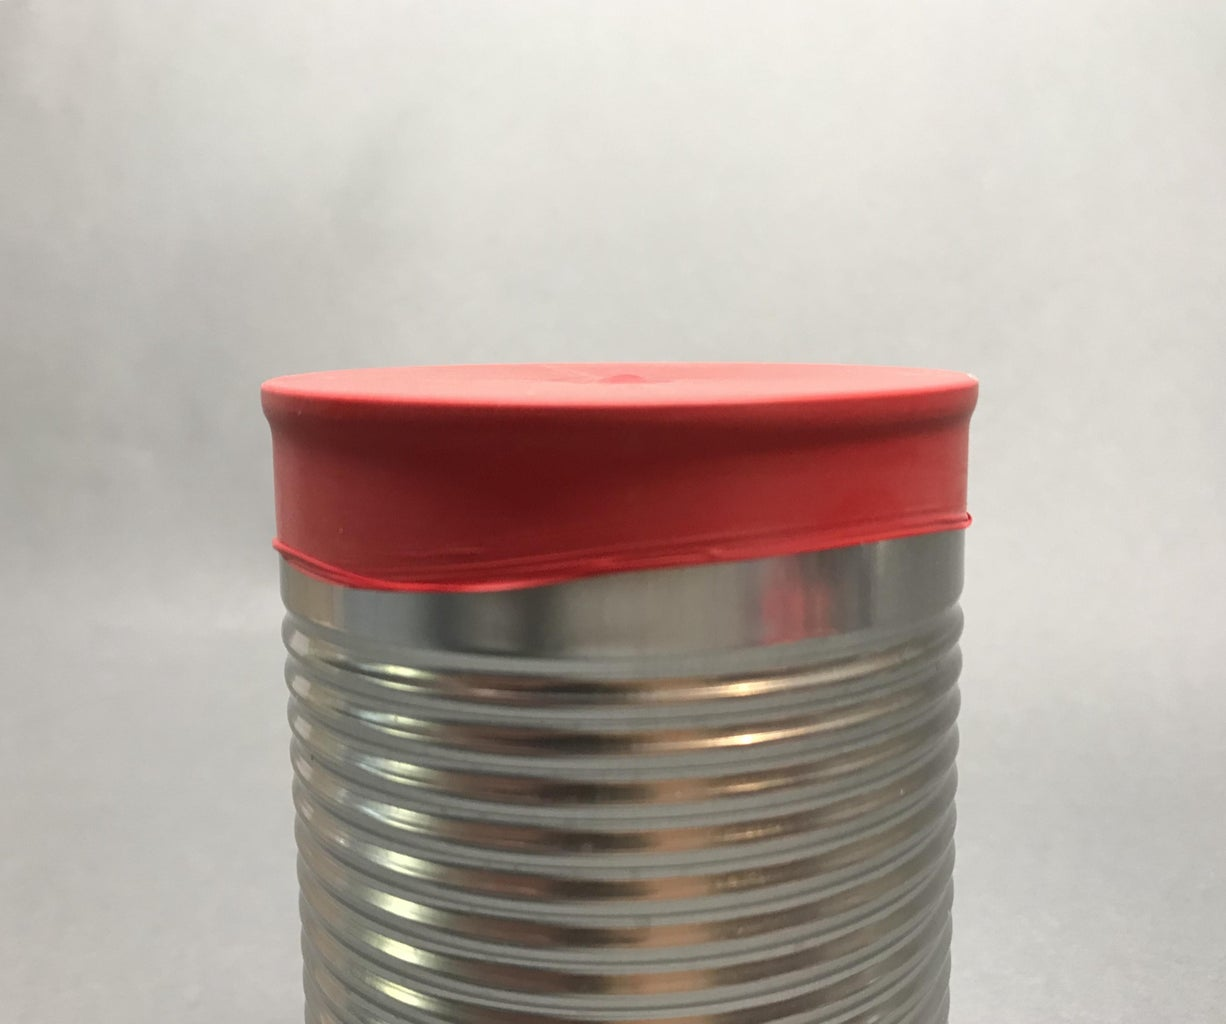 Alternately Use a 'Tin' Can